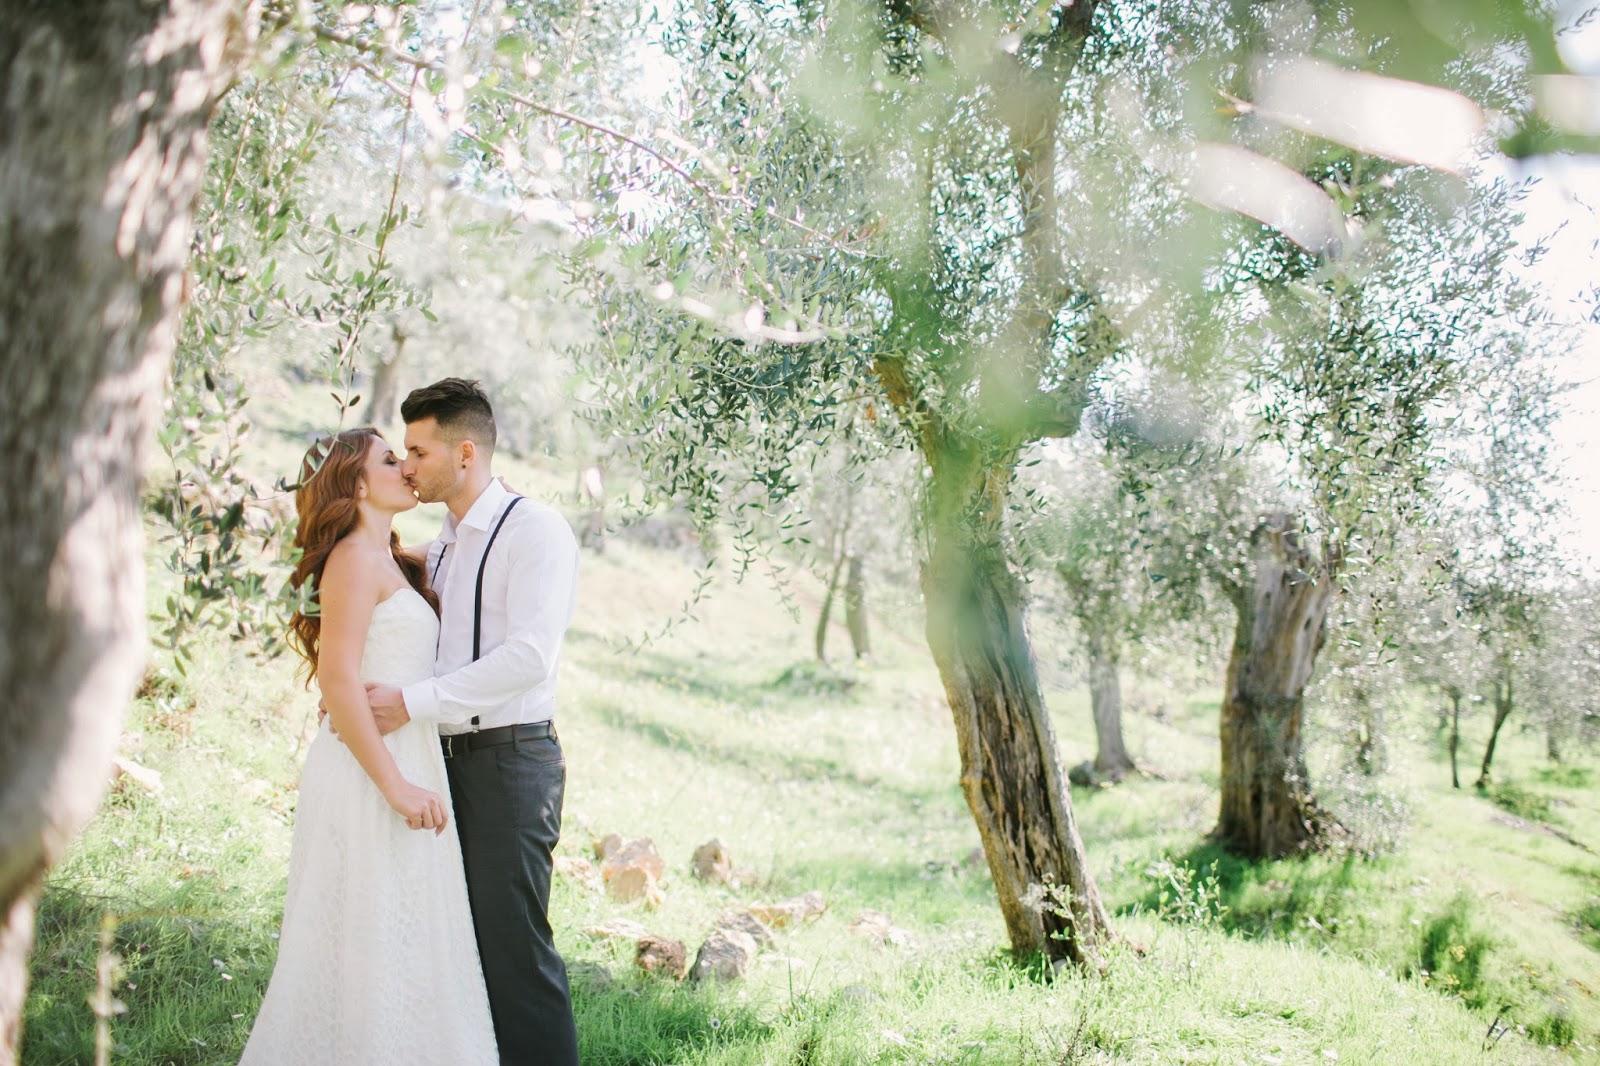 Matrimonio Tra Gli Ulivi Toscana : Matrimonio in toscana romantico shooting tra gli ulivi